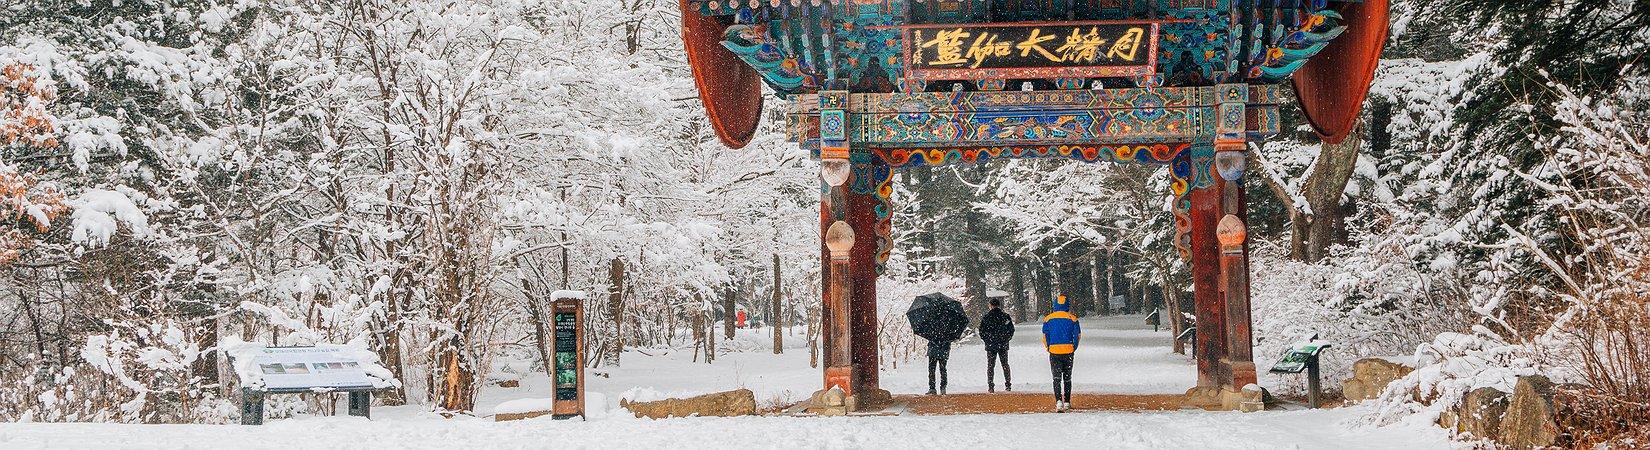 Saiba mais sobre Pyeongchang, condado que acolhe os Jogos Olímpicos de inverno de 2018